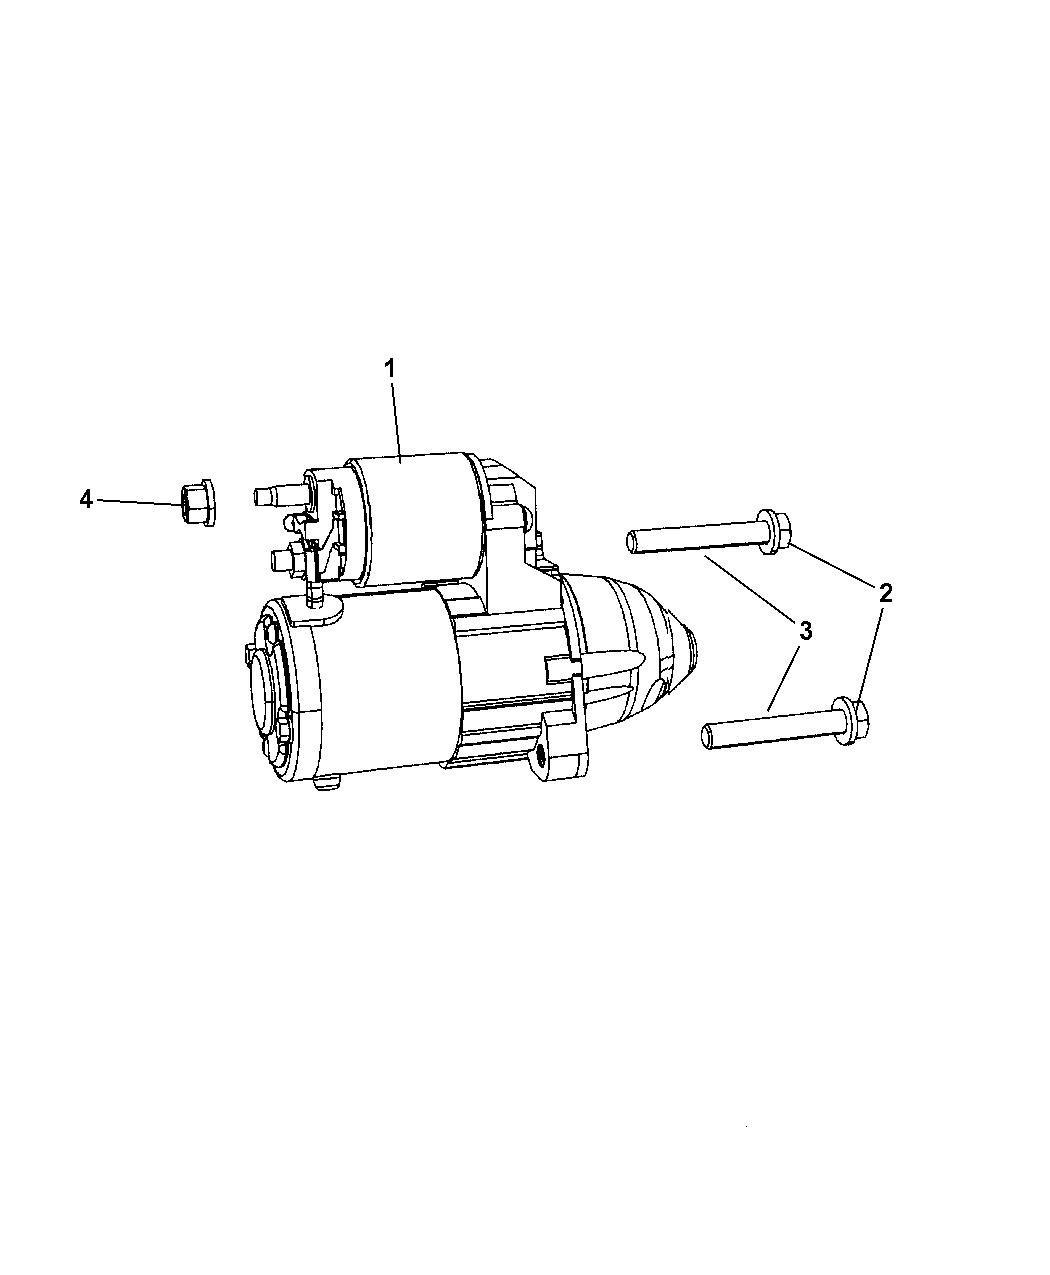 2007 Jeep Patriot Starter Mopar Parts Giant Wiring Diagram Compass Thumbnail 1